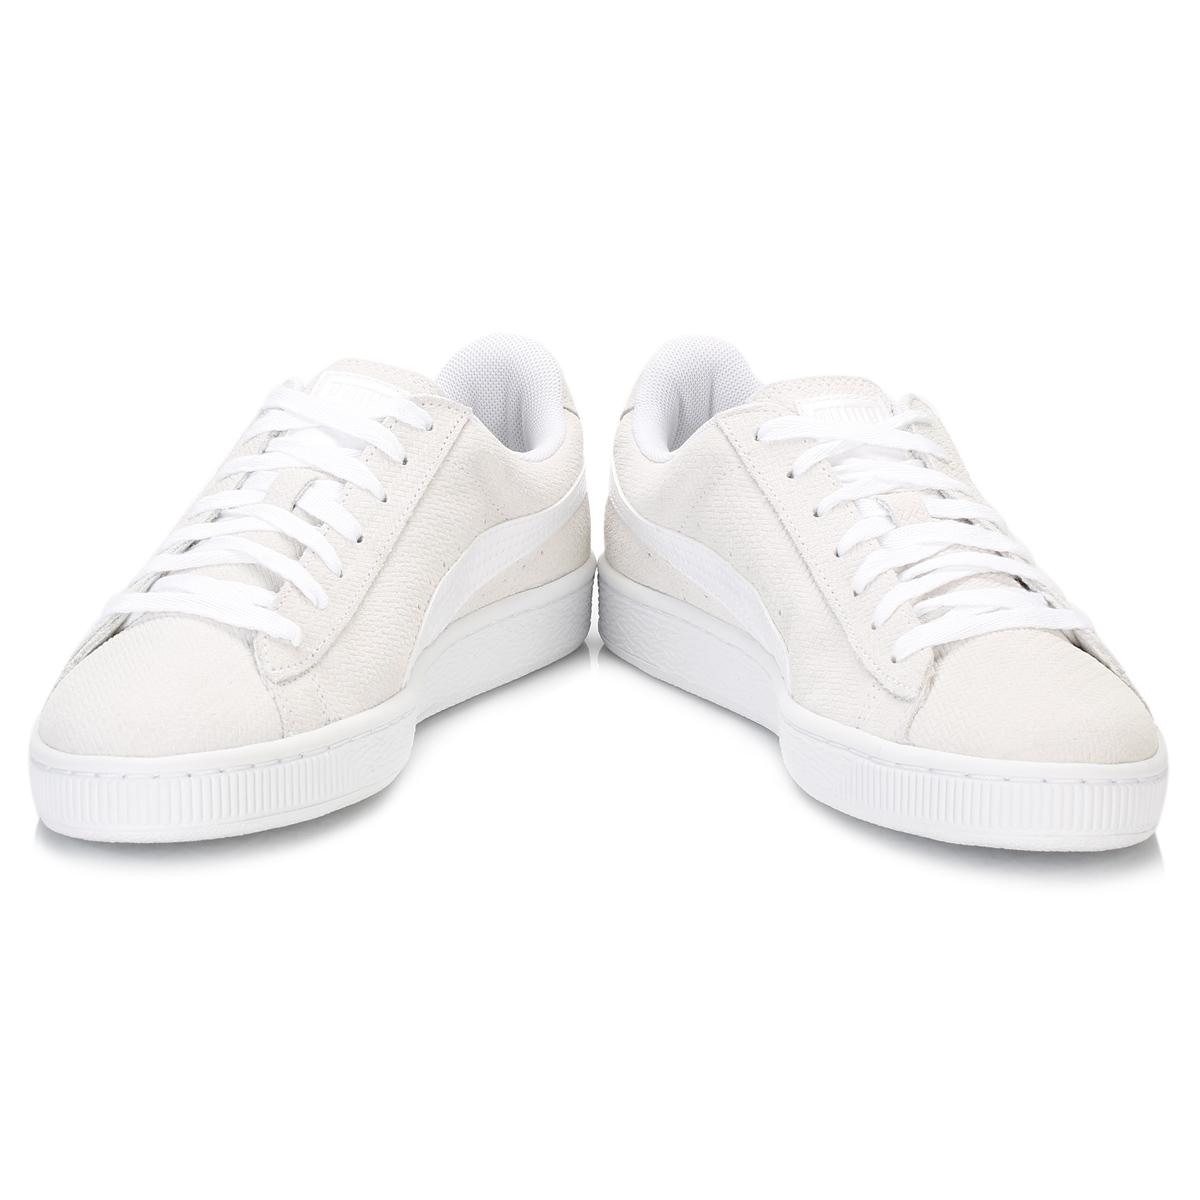 Chaussures Puma Femme Blanc